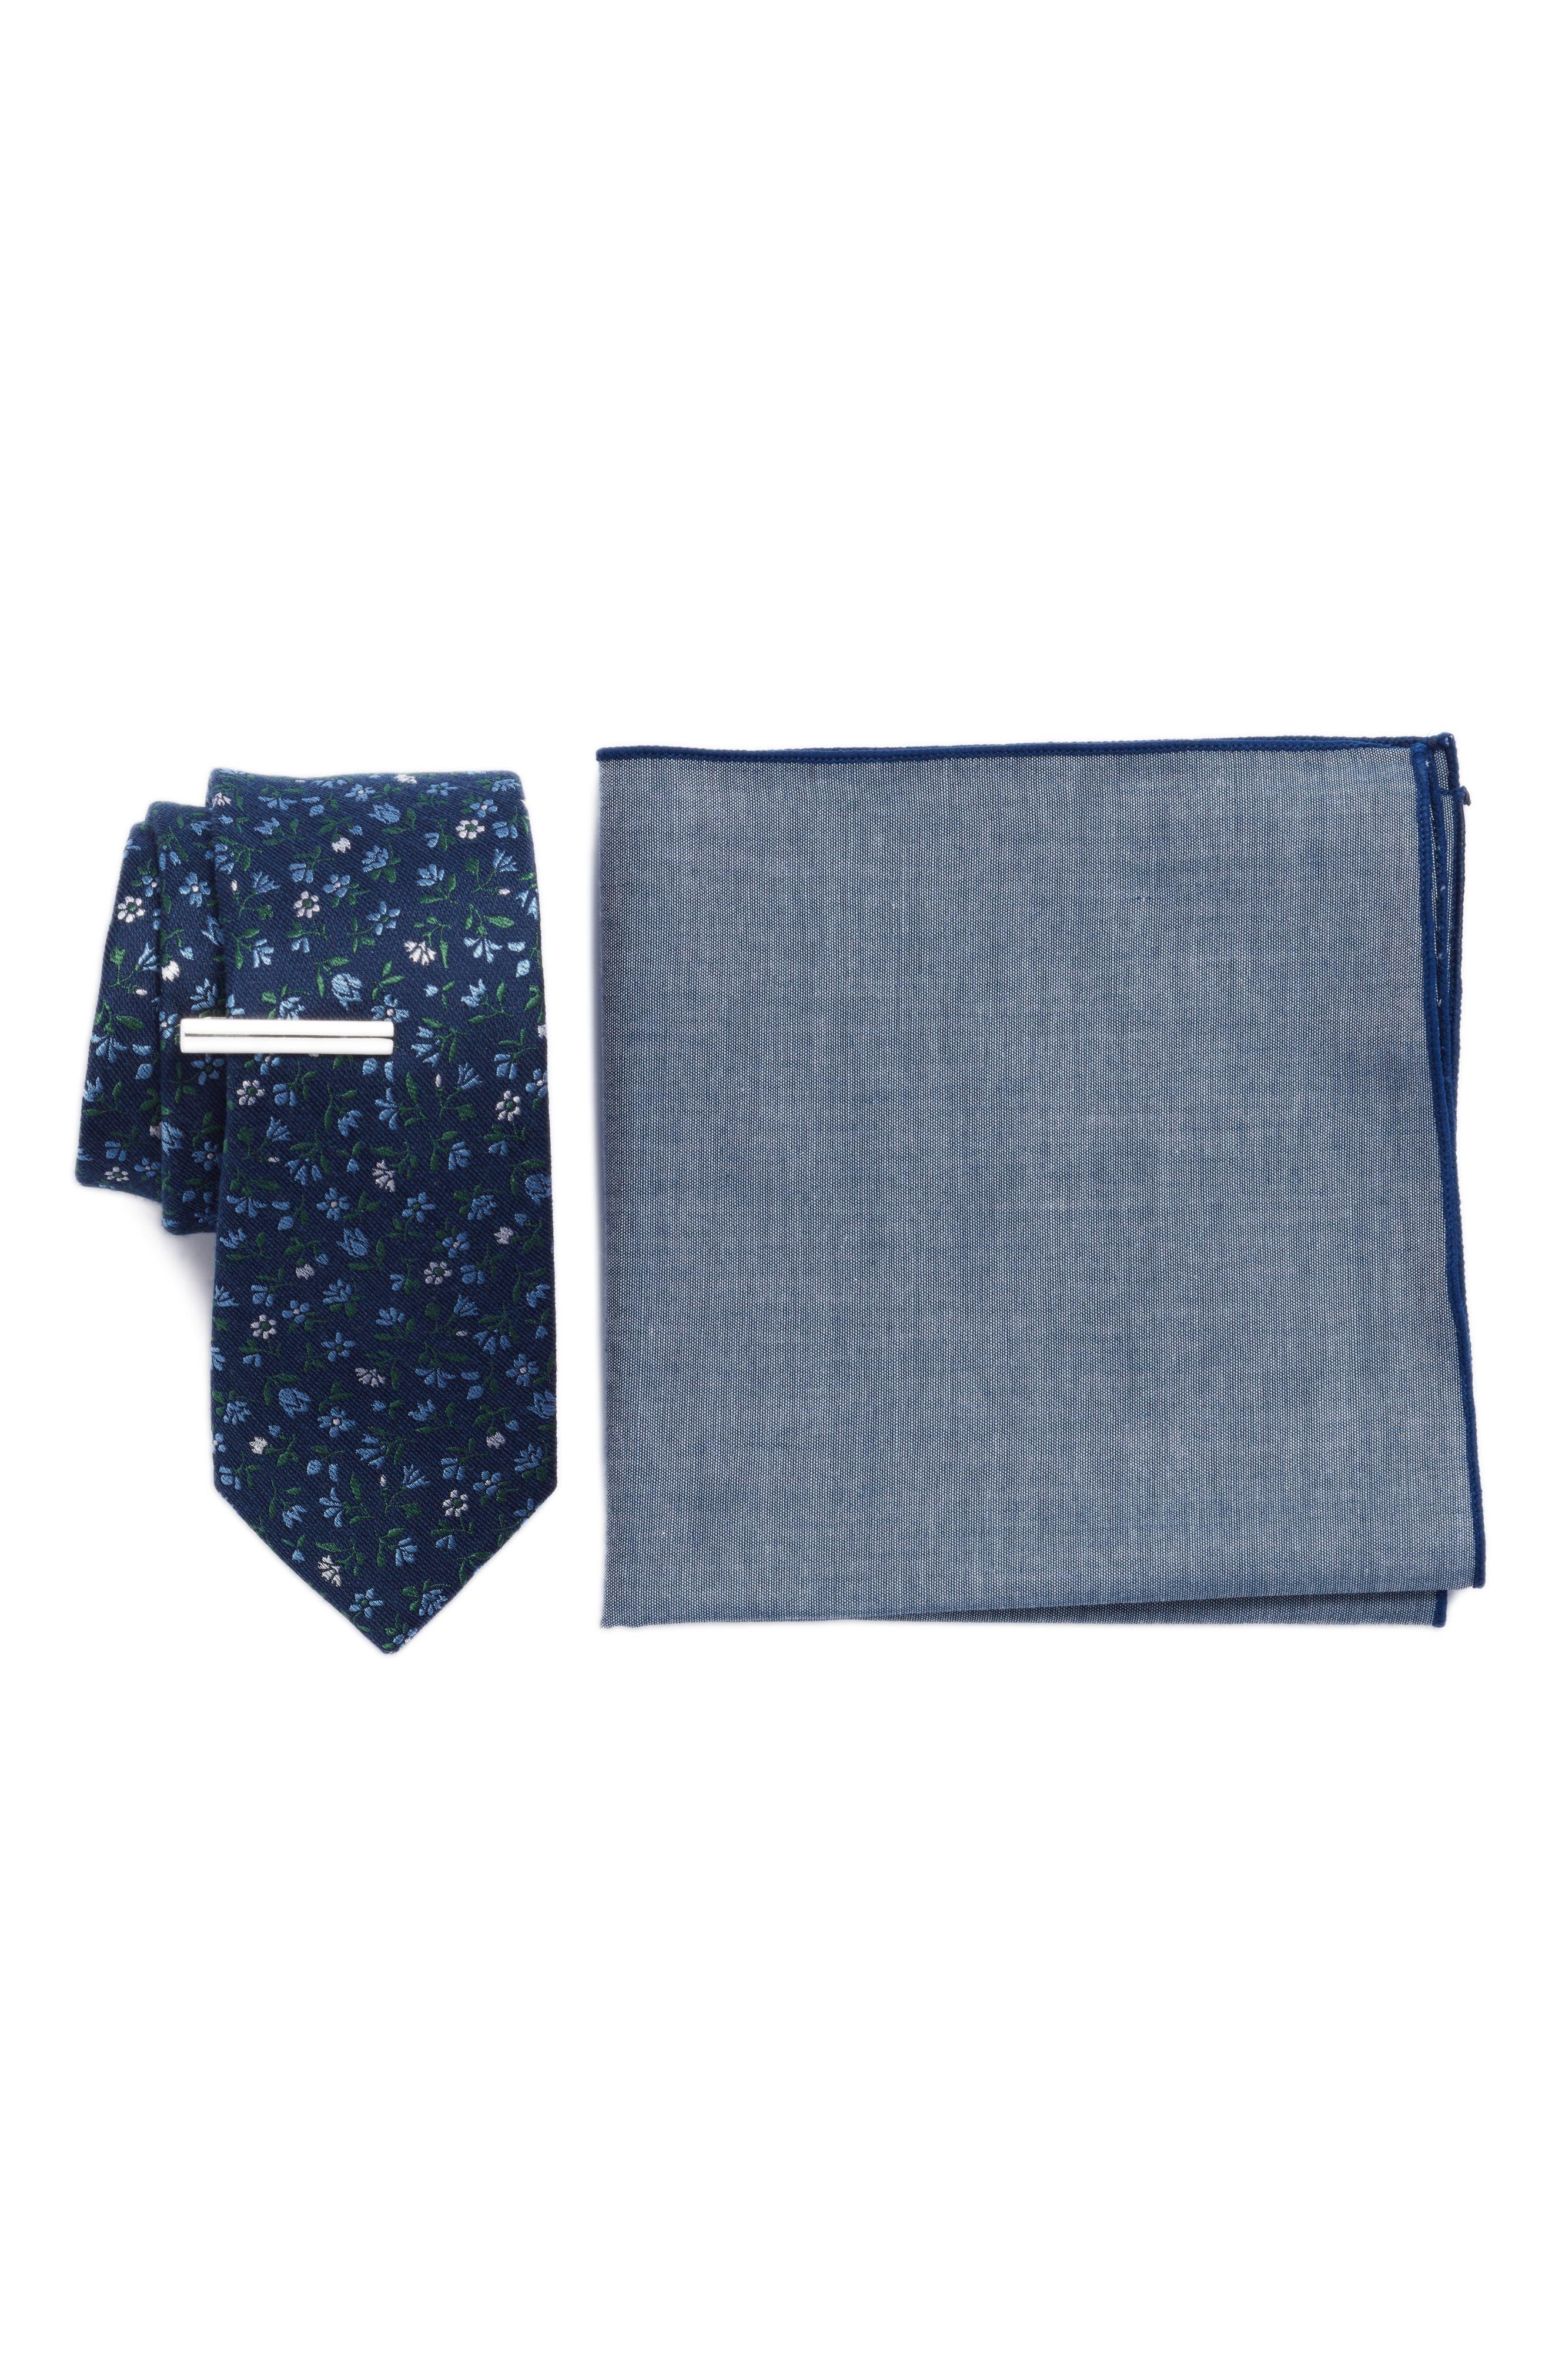 THE TIE BAR Floral Acres 3-Piece Skinny Tie Style Box, Main, color, NAVY